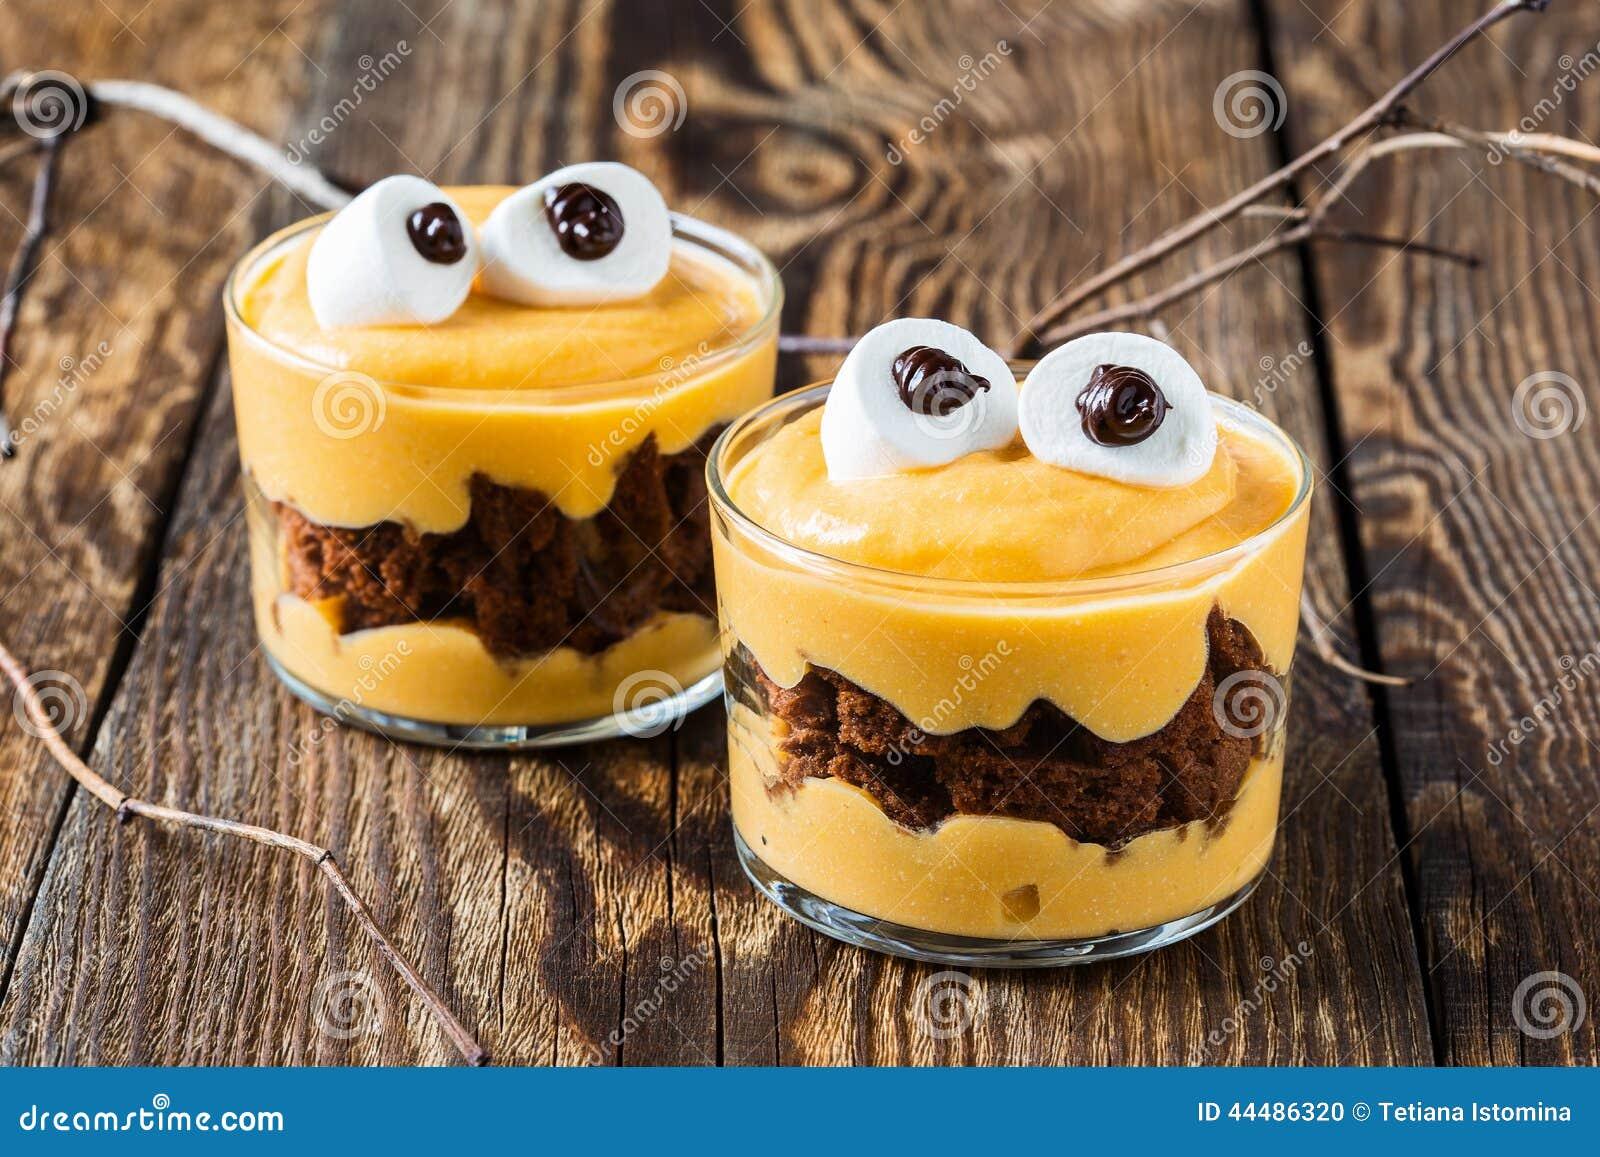 Halloween Treats Little Monster Dessert Stock Photo Image